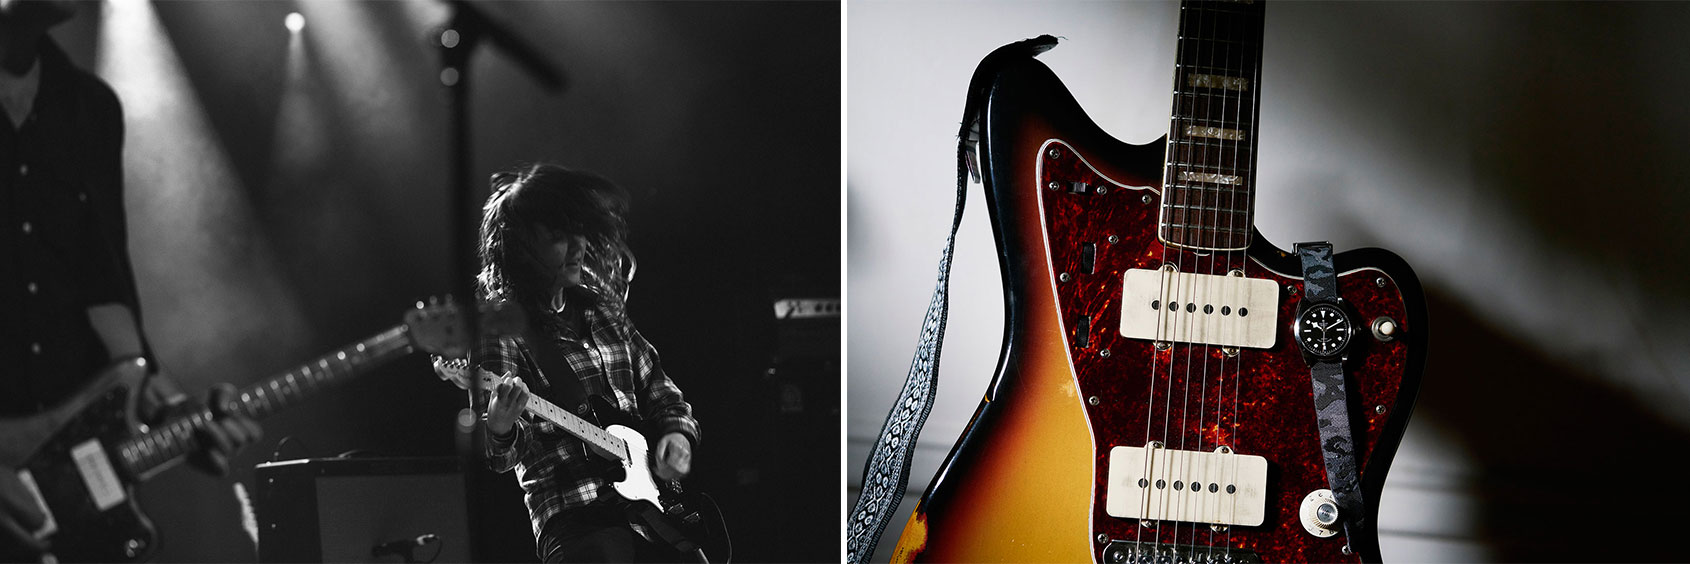 tudor-bb36-kp-guitar